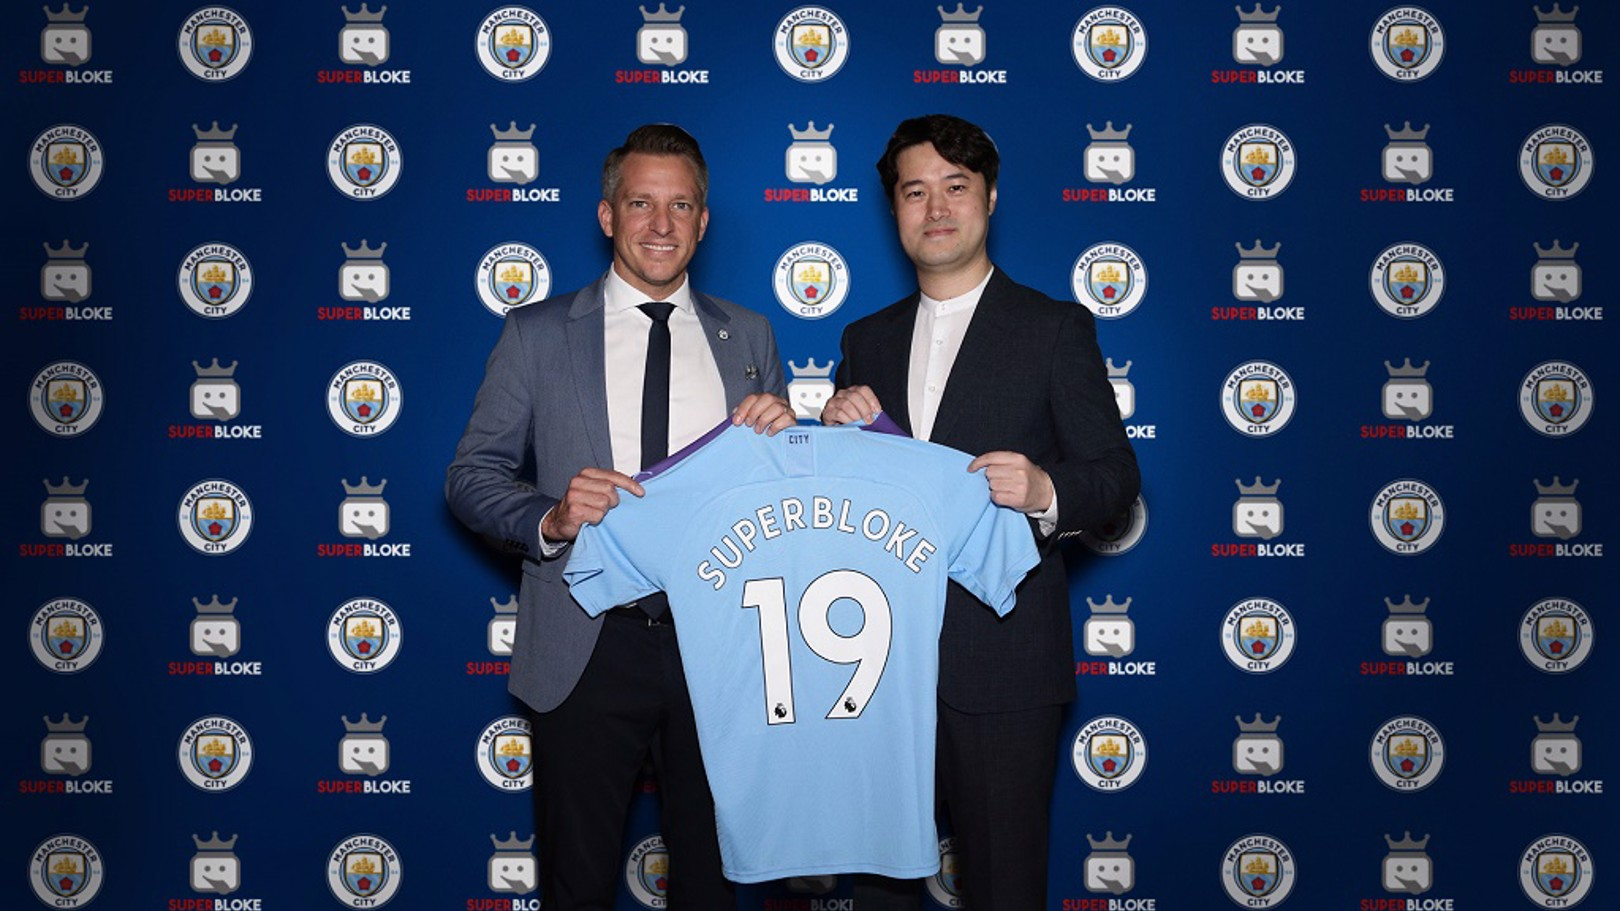 City announce Superbloke partnership